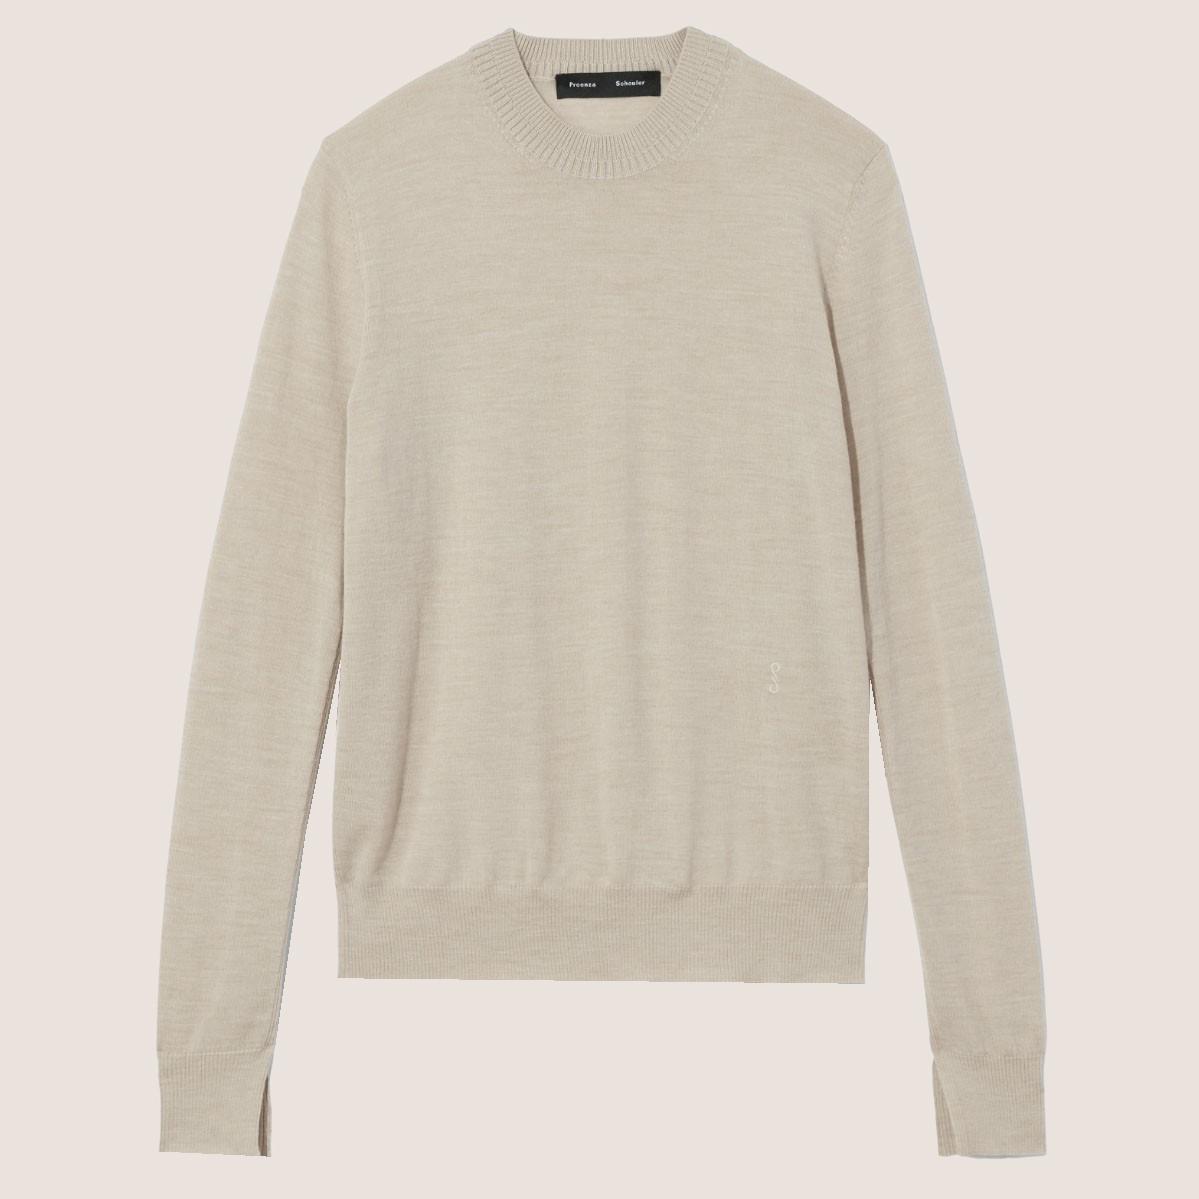 Eco Superfine Merino Sweater